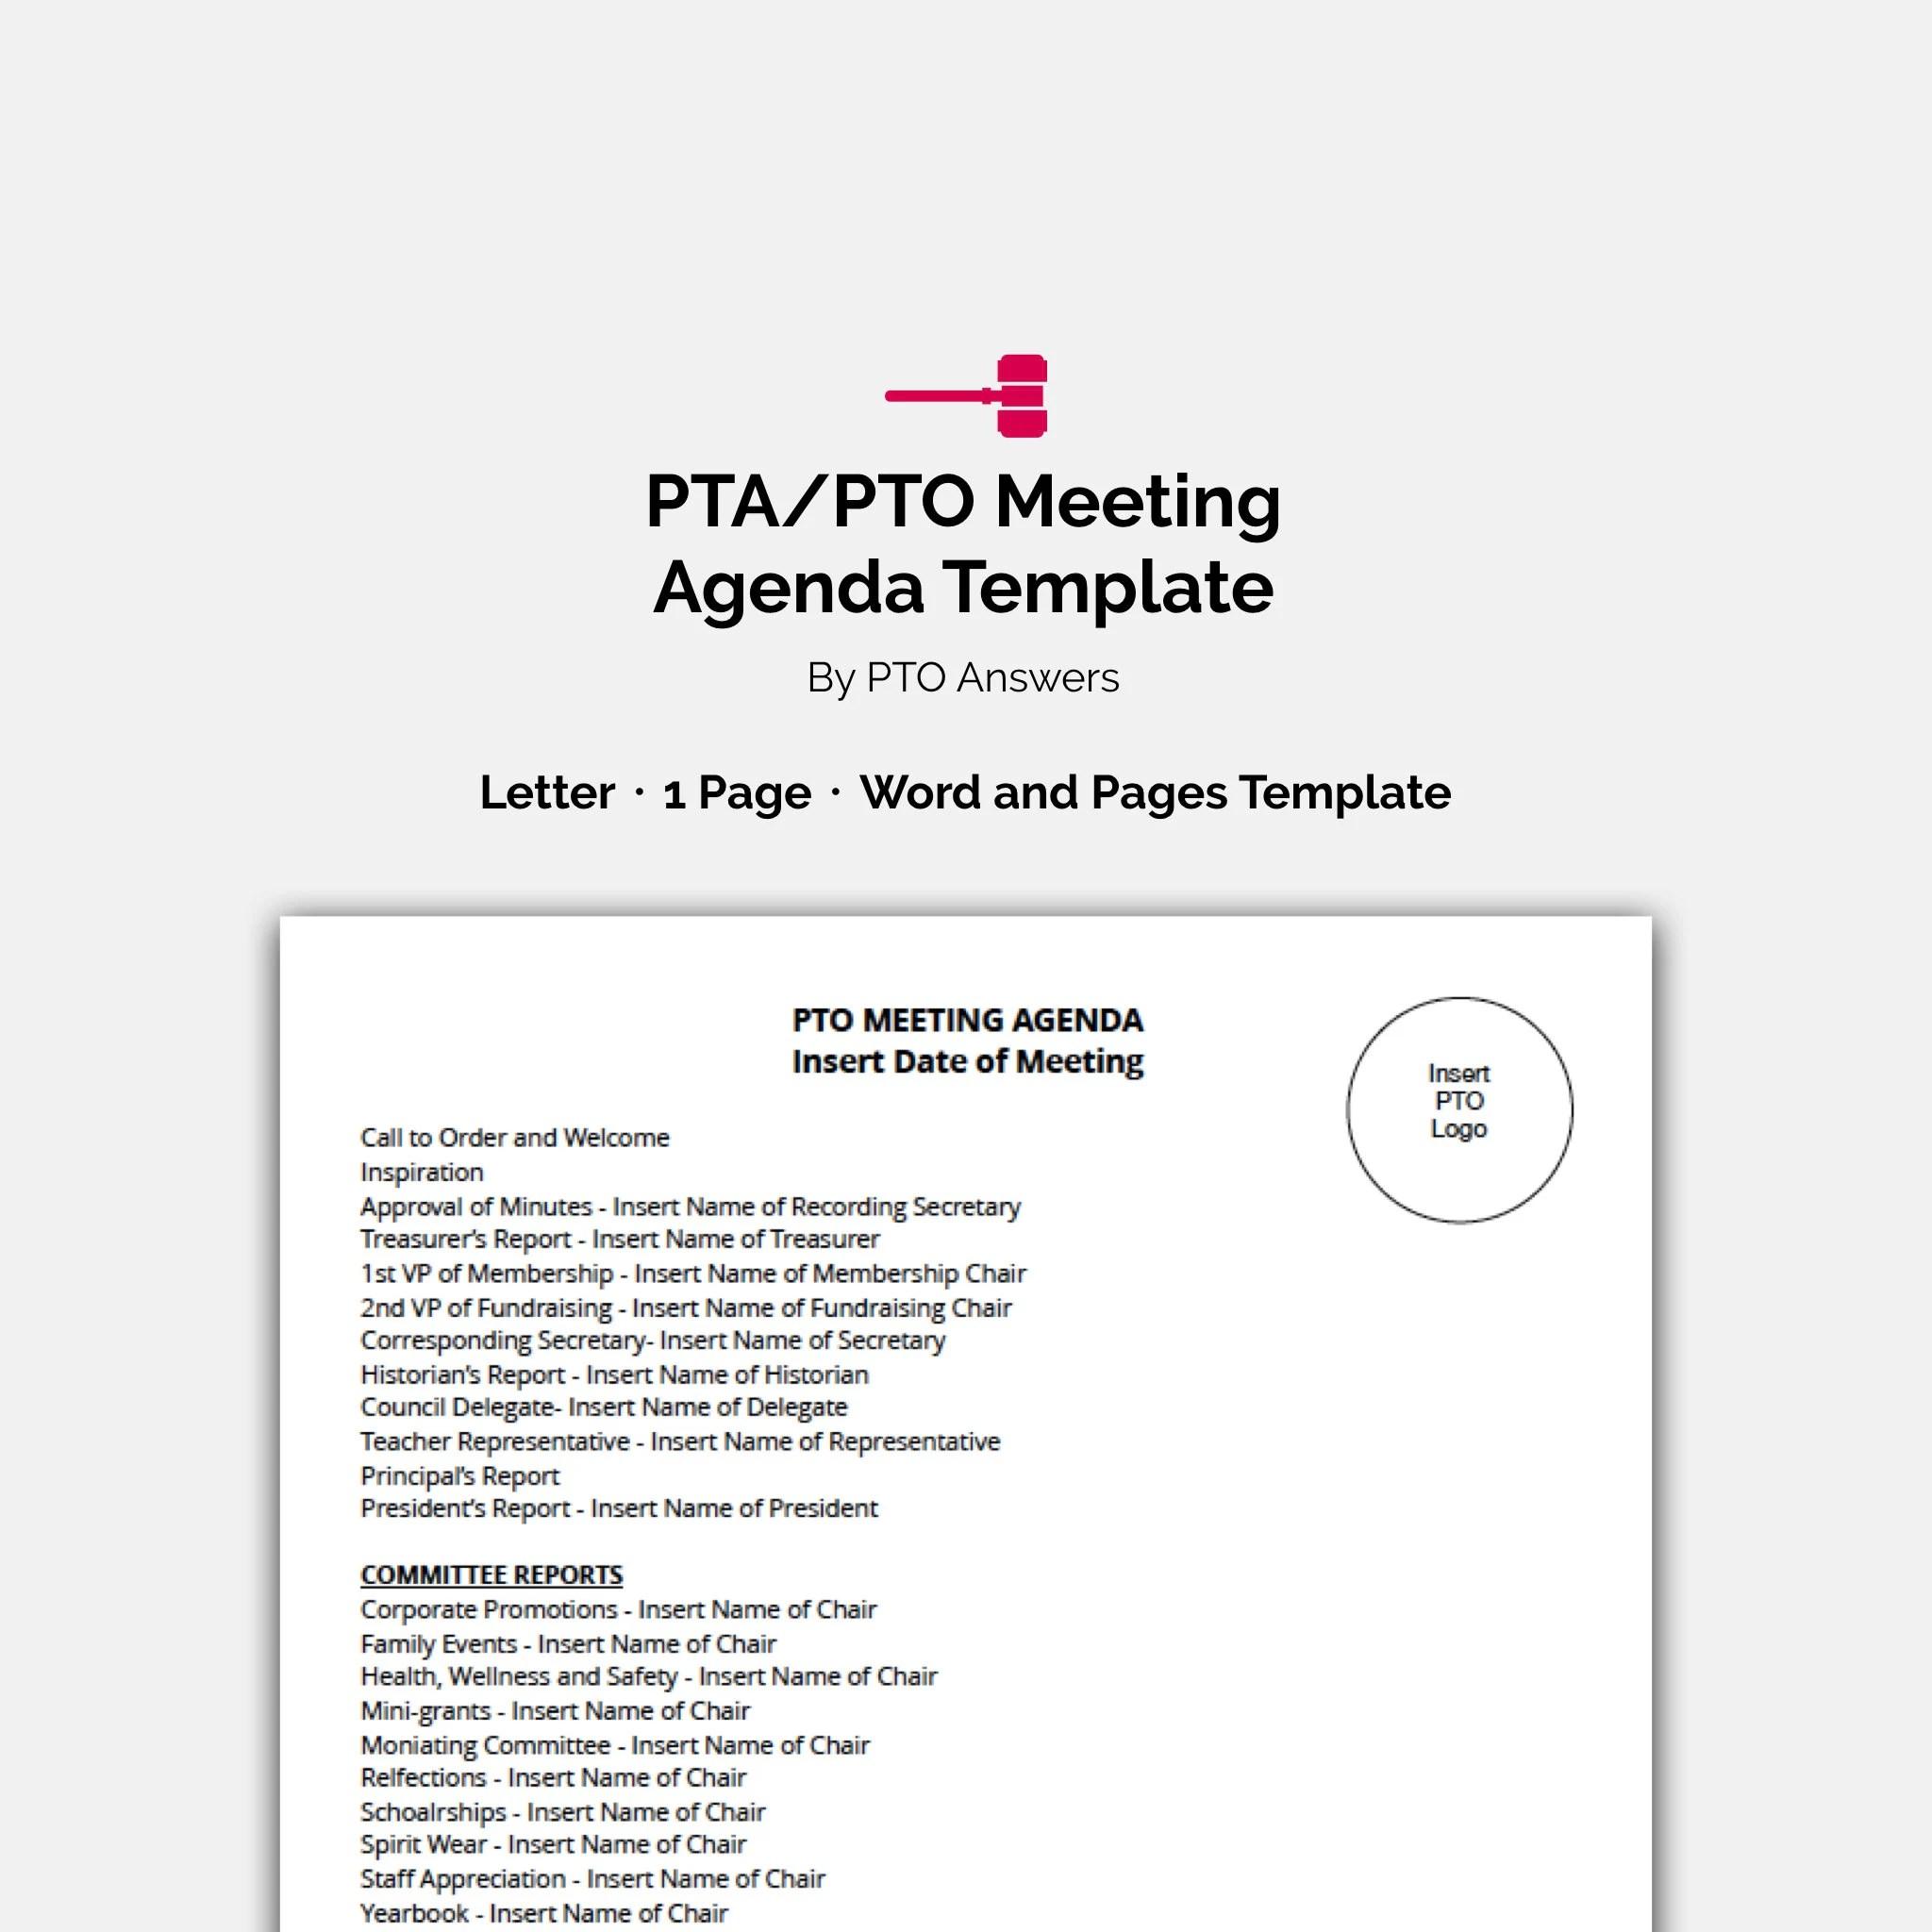 PTA / PTO Meeting Agenda Template  Fully Editable Instant Etsy